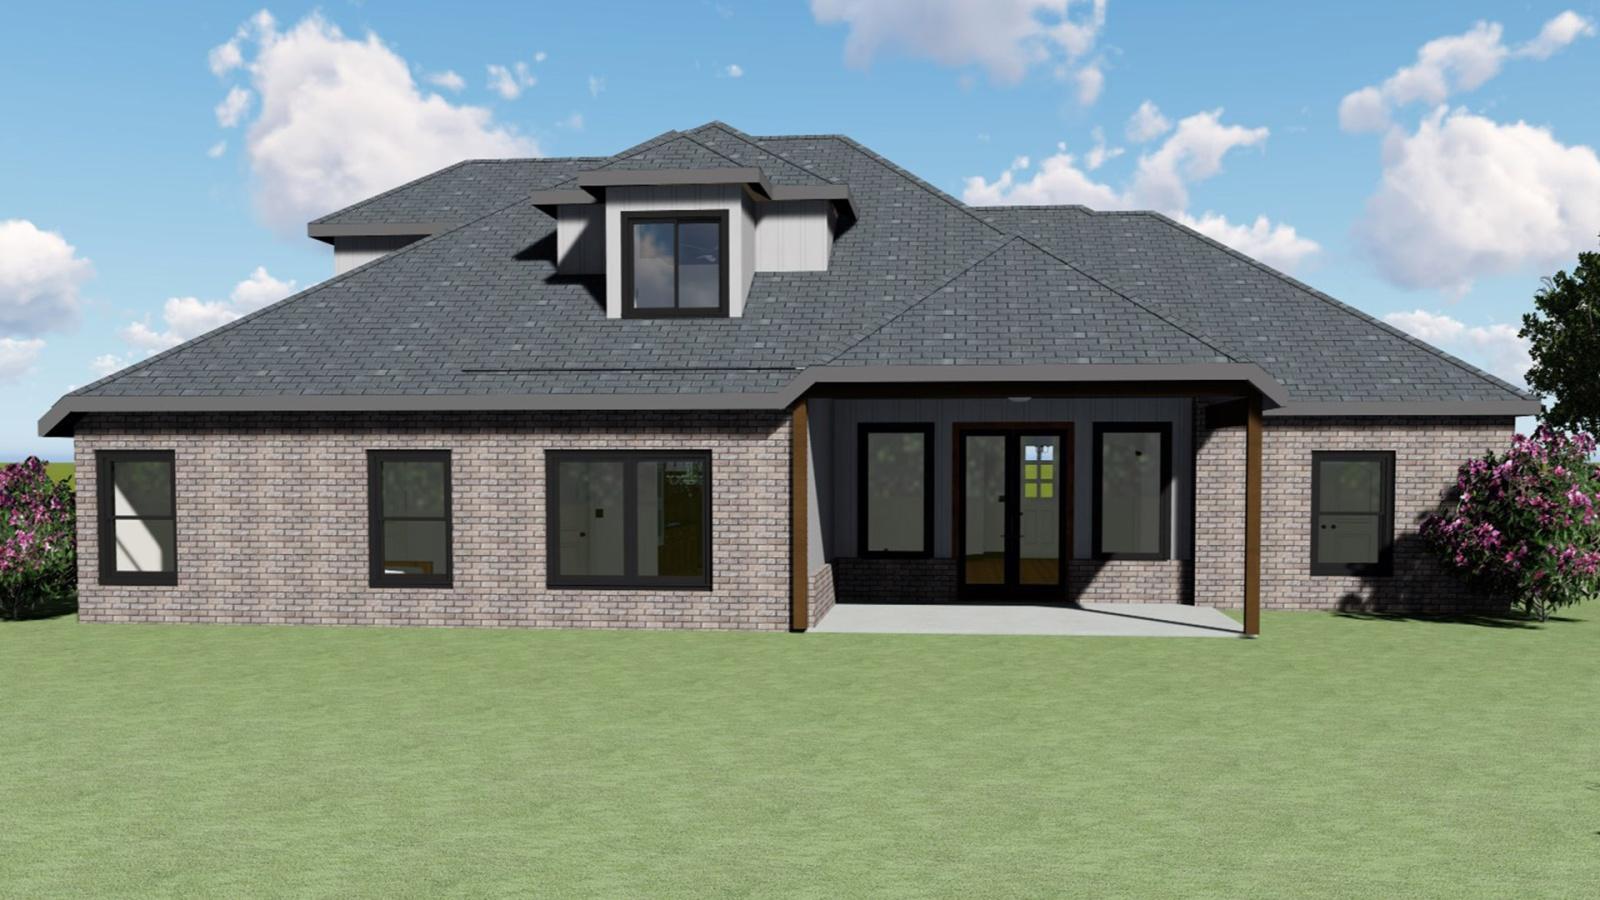 4 Bedrooms Bedrooms, ,3 BathroomsBathrooms,Custom Home,Home Plans,1007